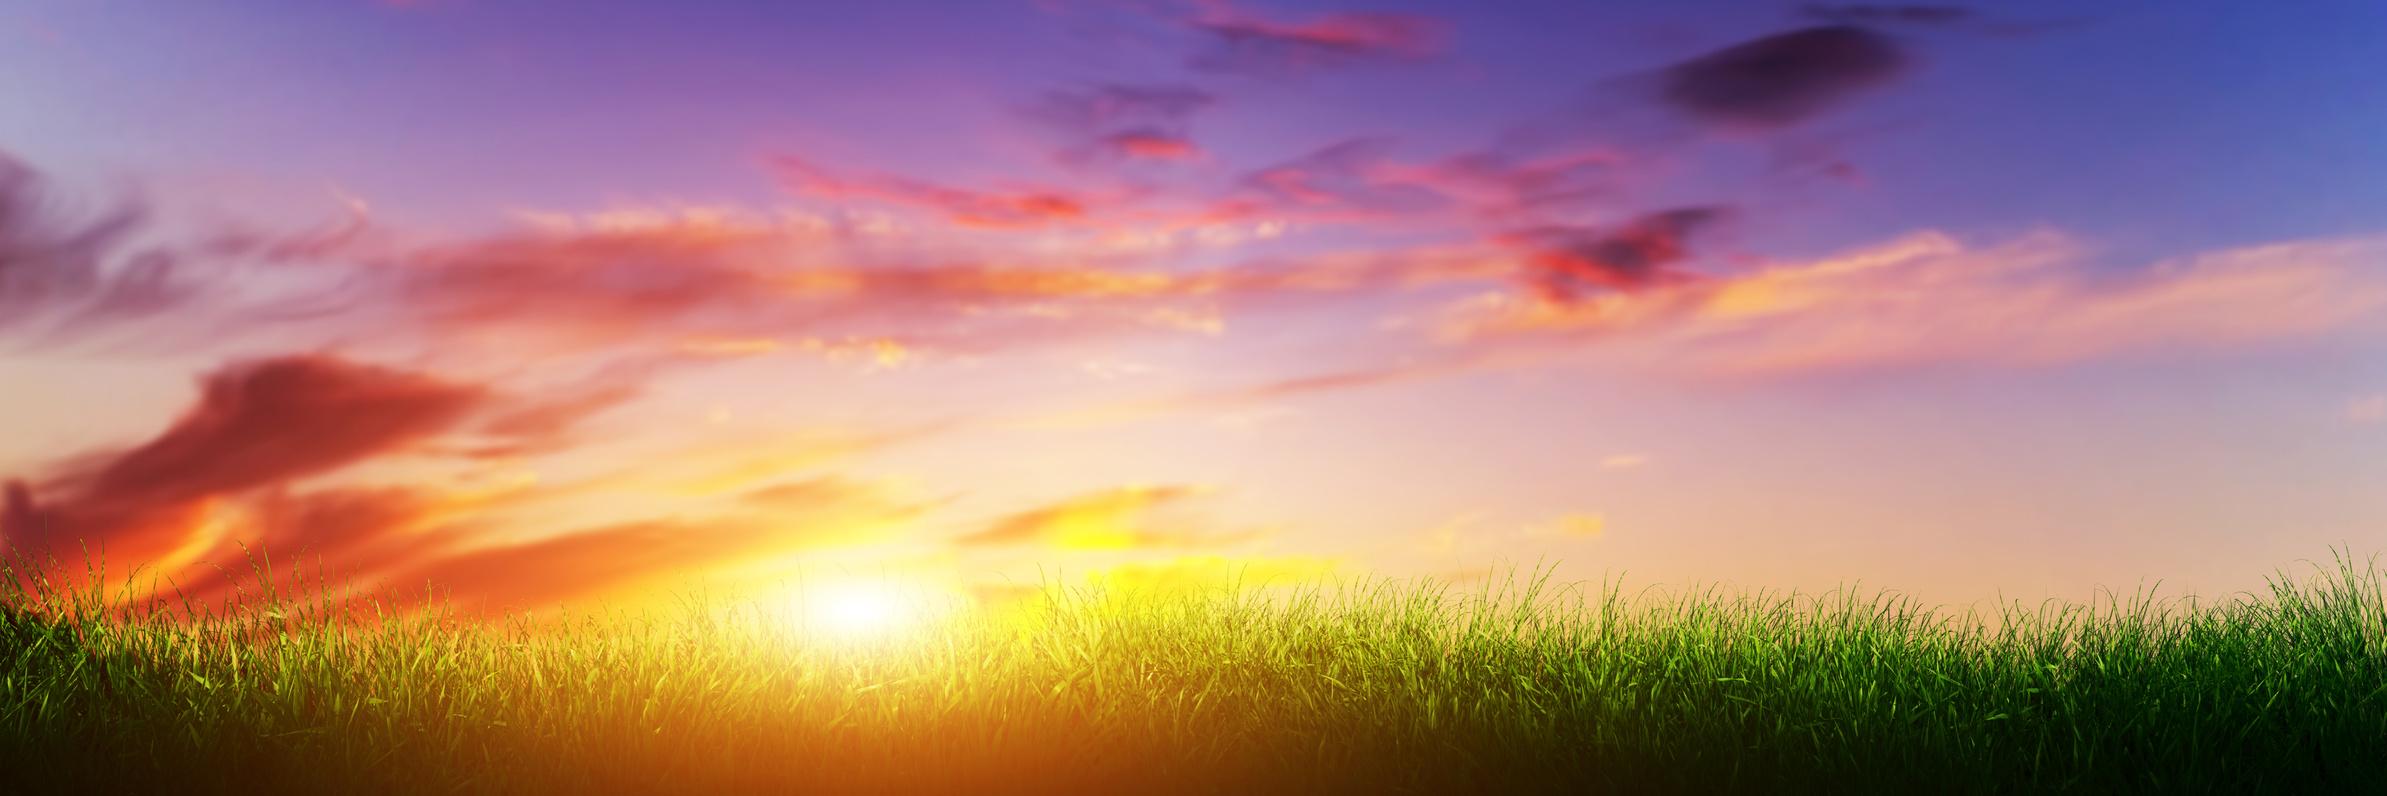 Green grass on sunset sunny sky. Panorama, banner